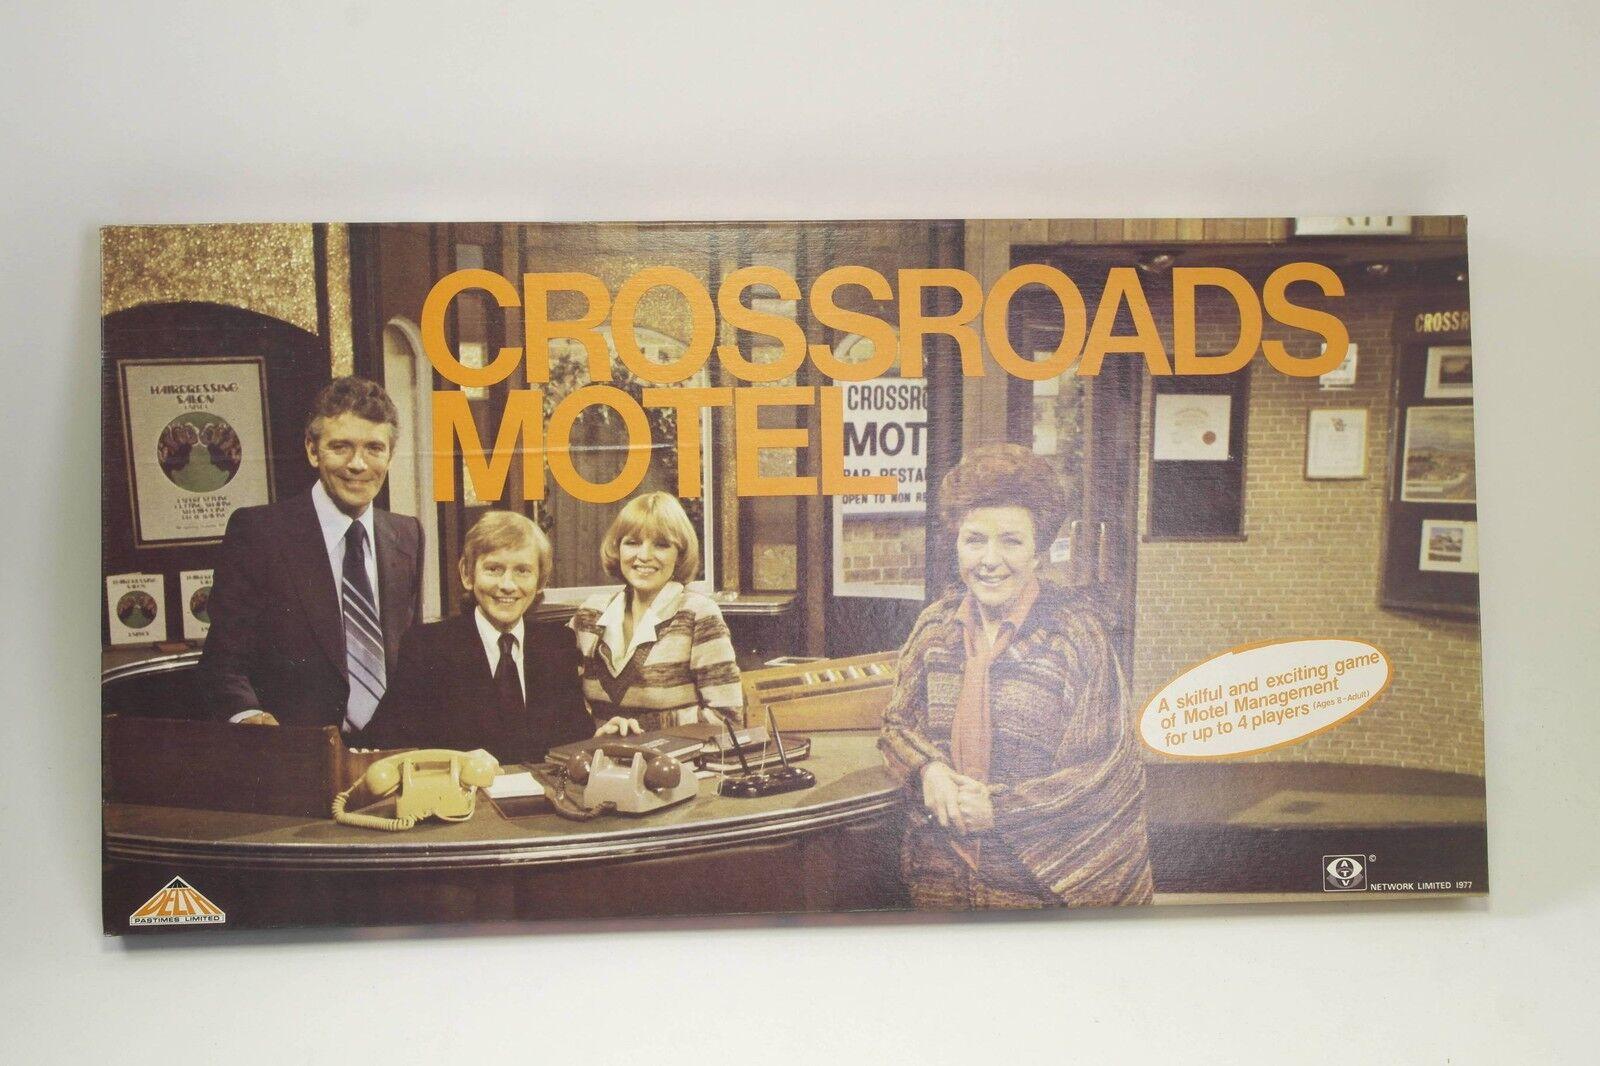 Delta zeitGrünreib - crossroads motel vintage - brettspiel - a +   a